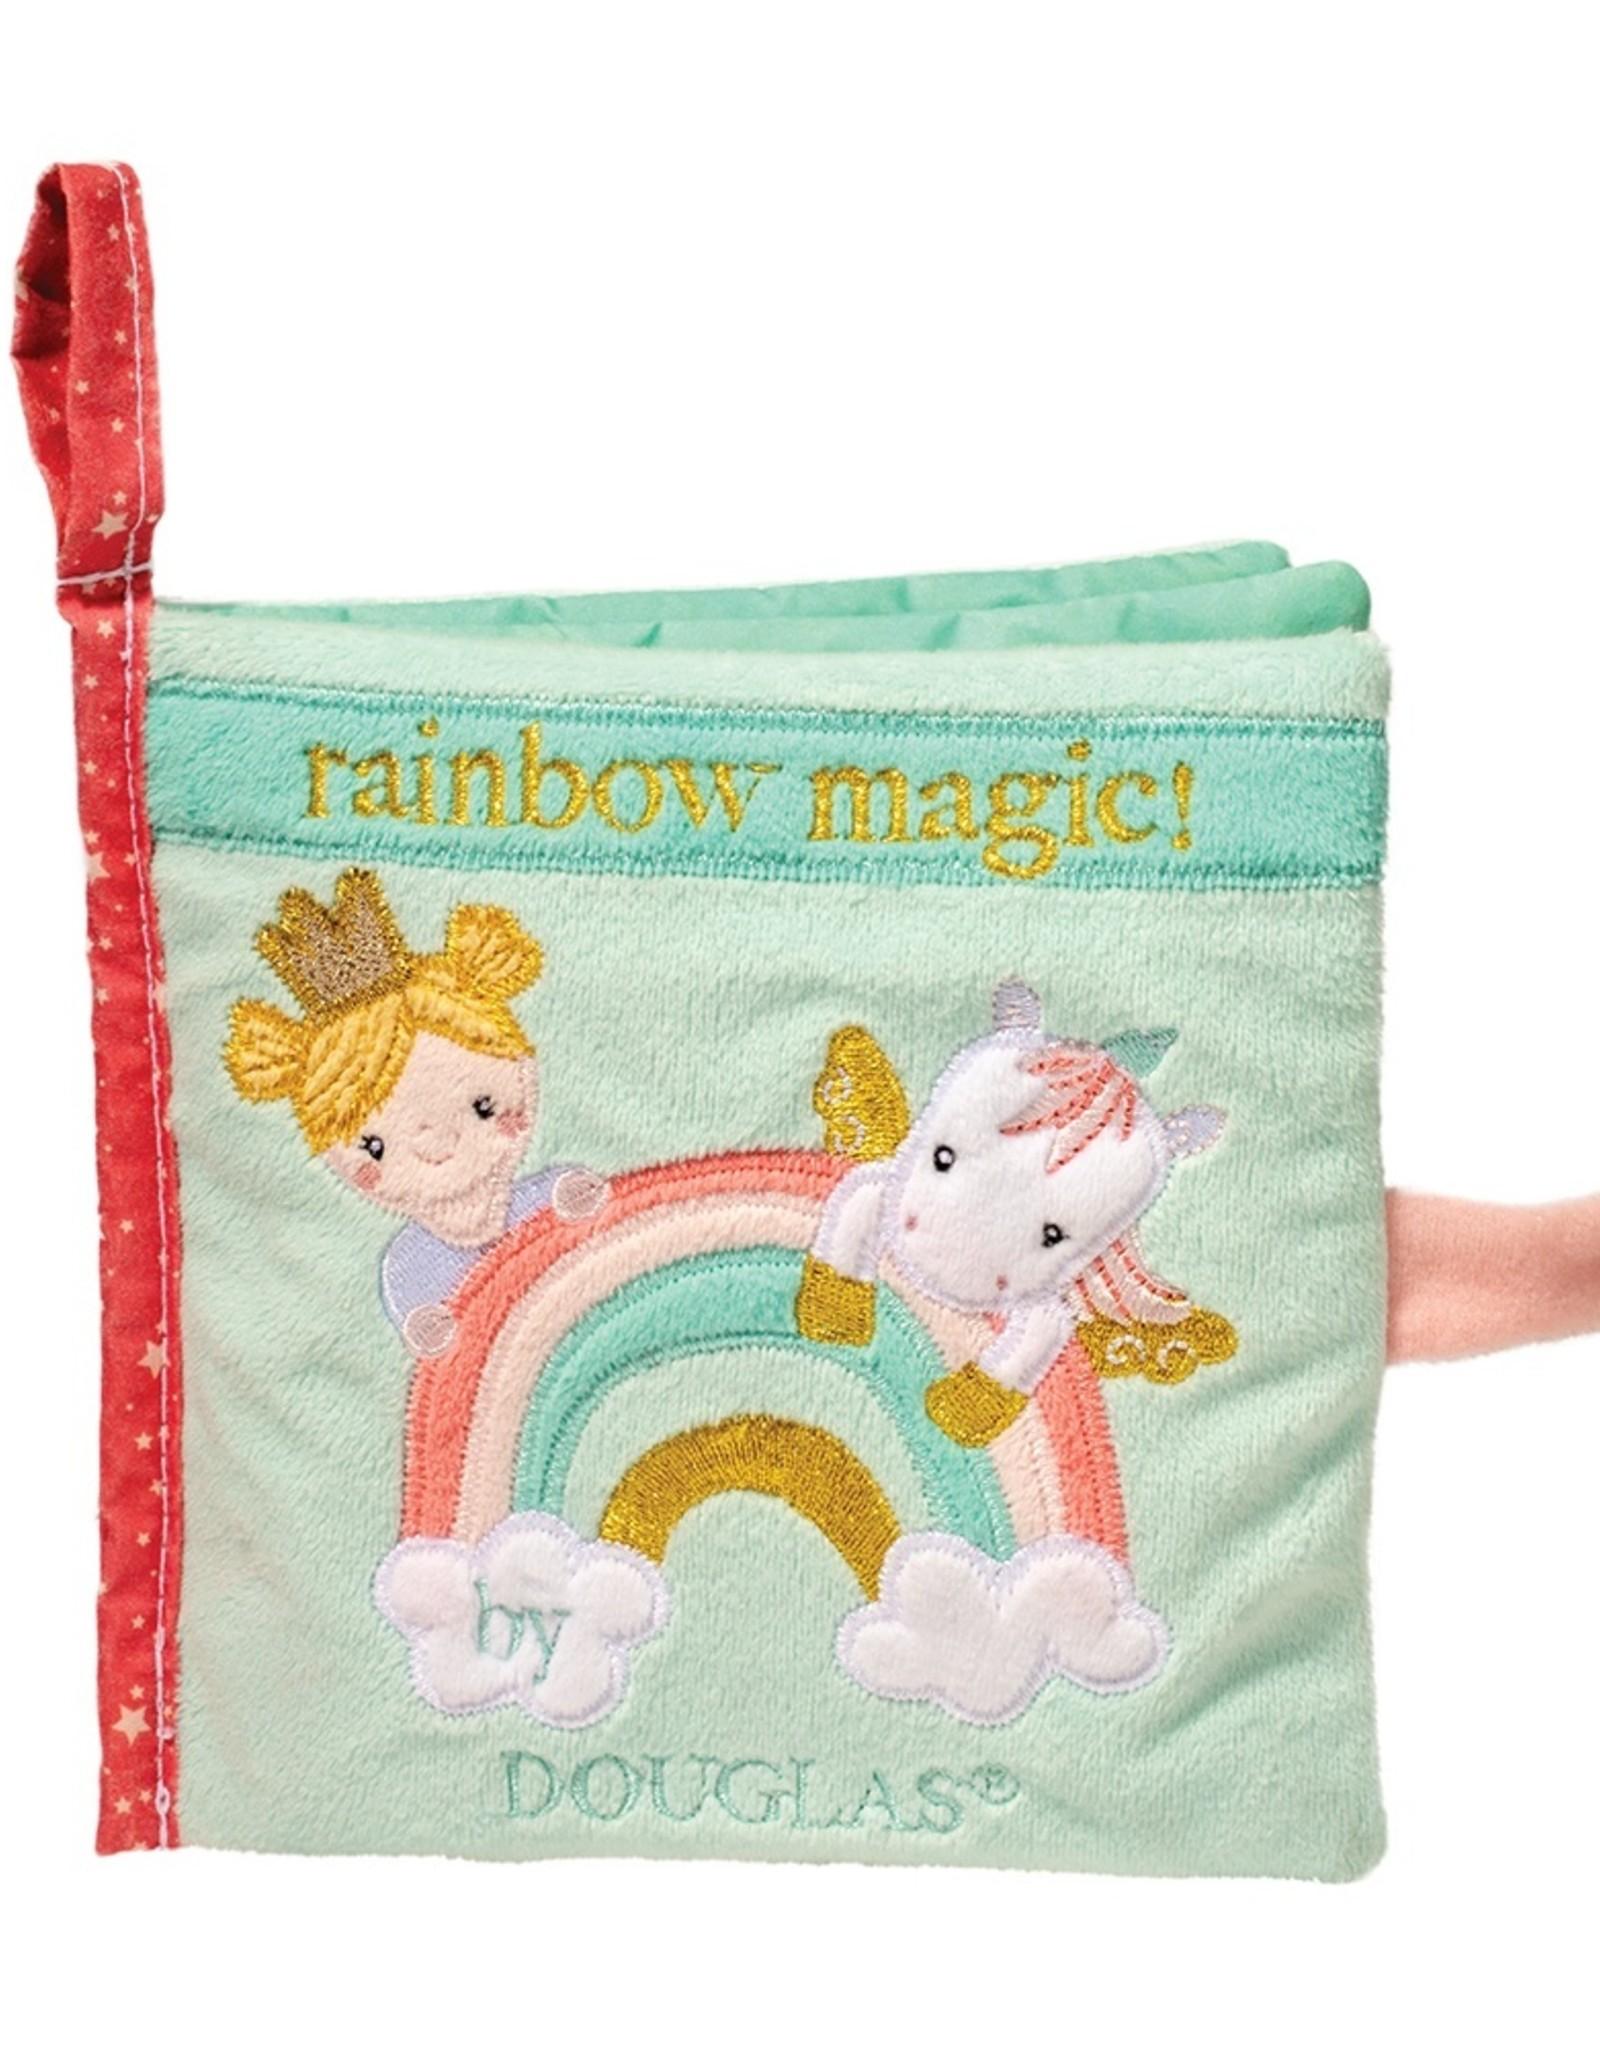 Douglas Douglas - Rainbow Magic Activity Book